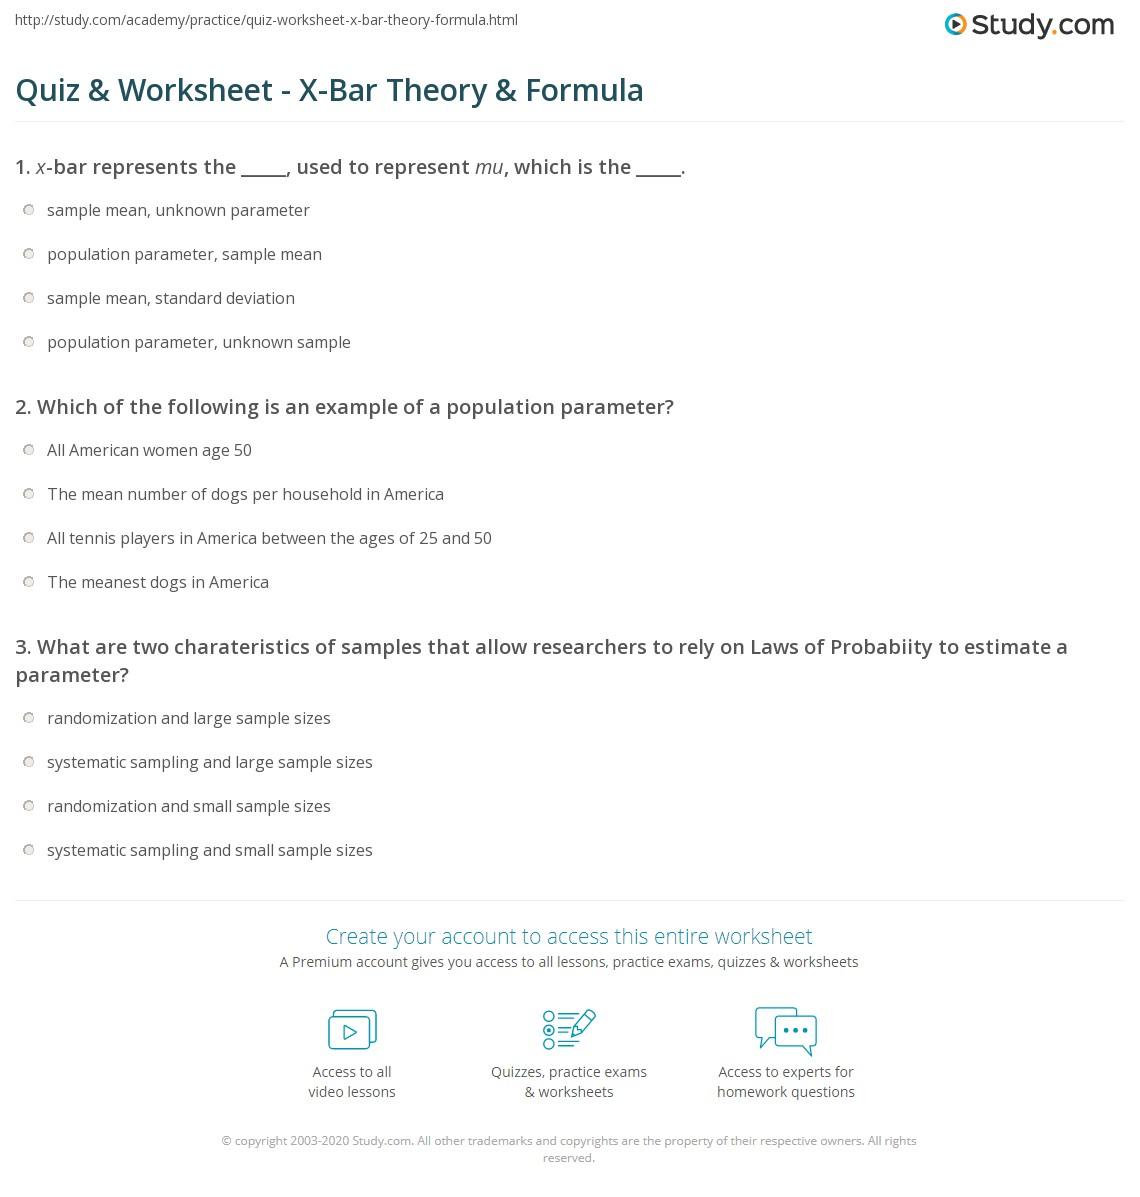 Quiz & Worksheet - X-Bar Theory & Formula | Study.com